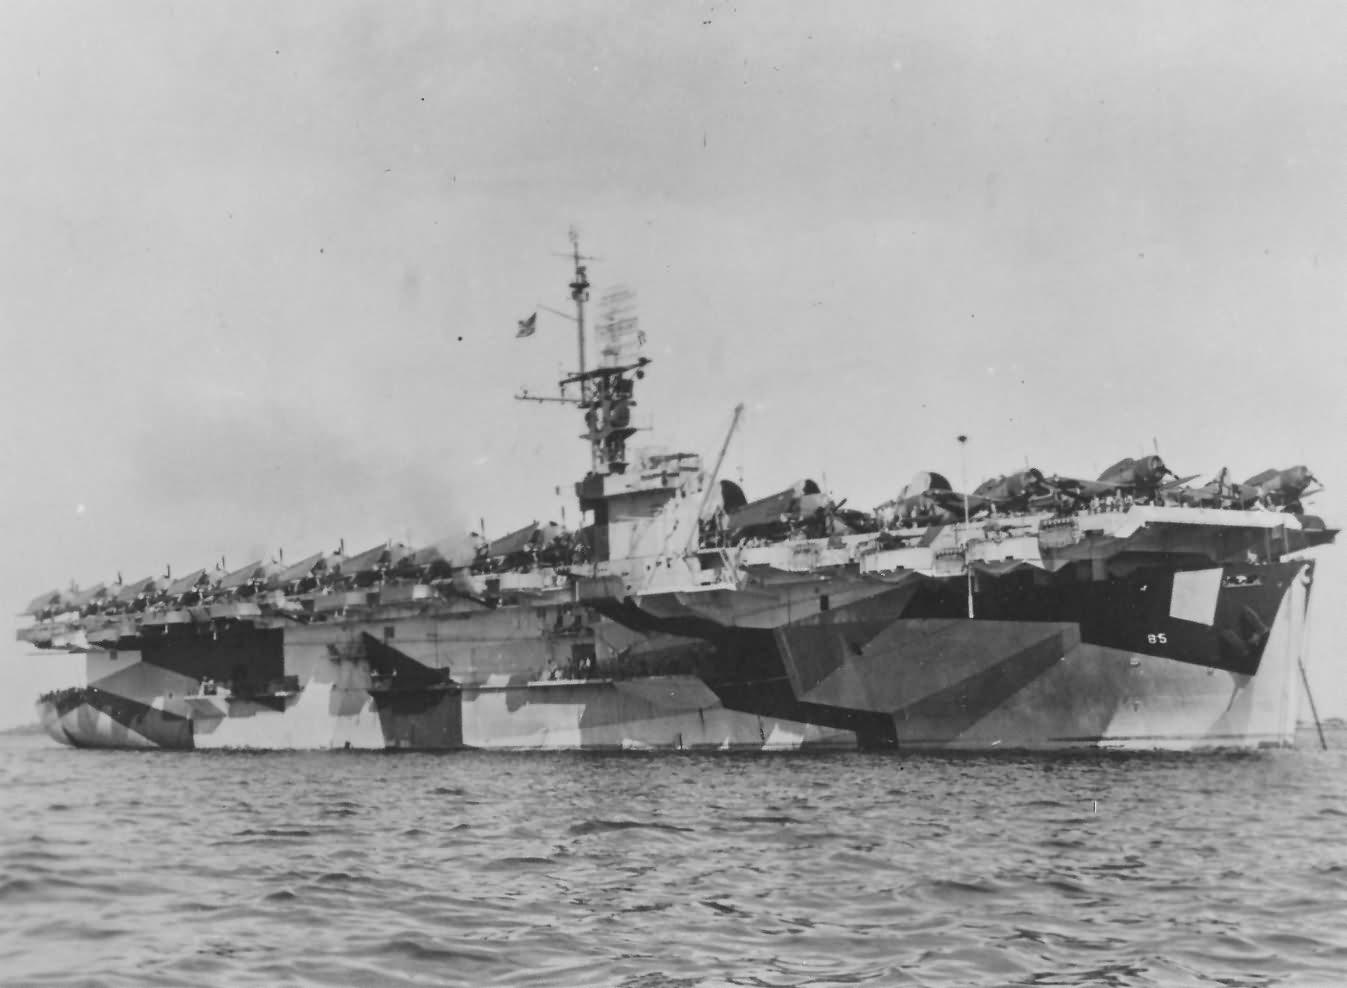 Escort carrier USS Shipley Bay CVE-85